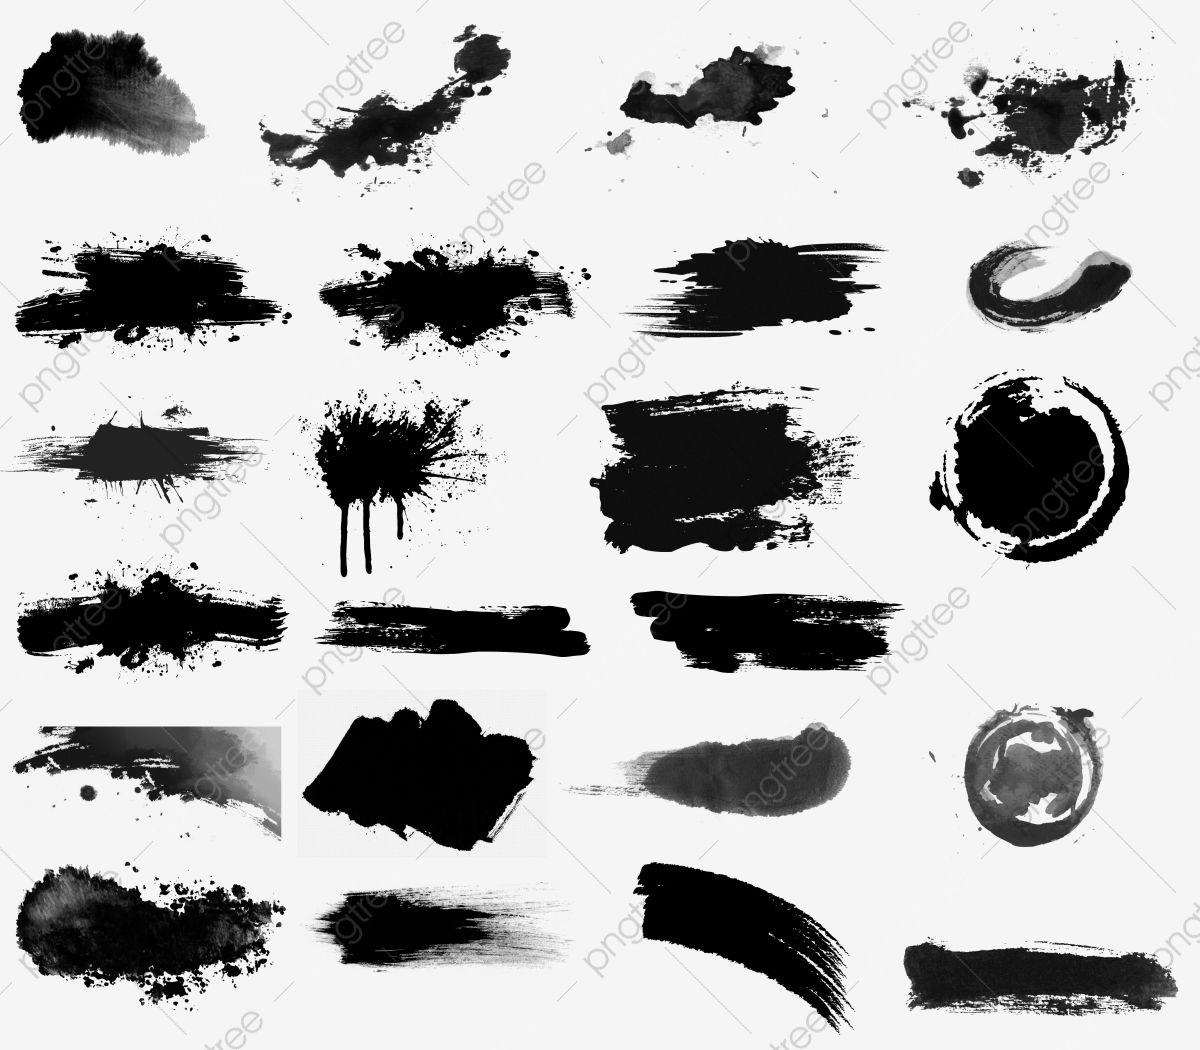 Black Ink Brush Brush Effect In 2020 Watercolor Brushes Brush